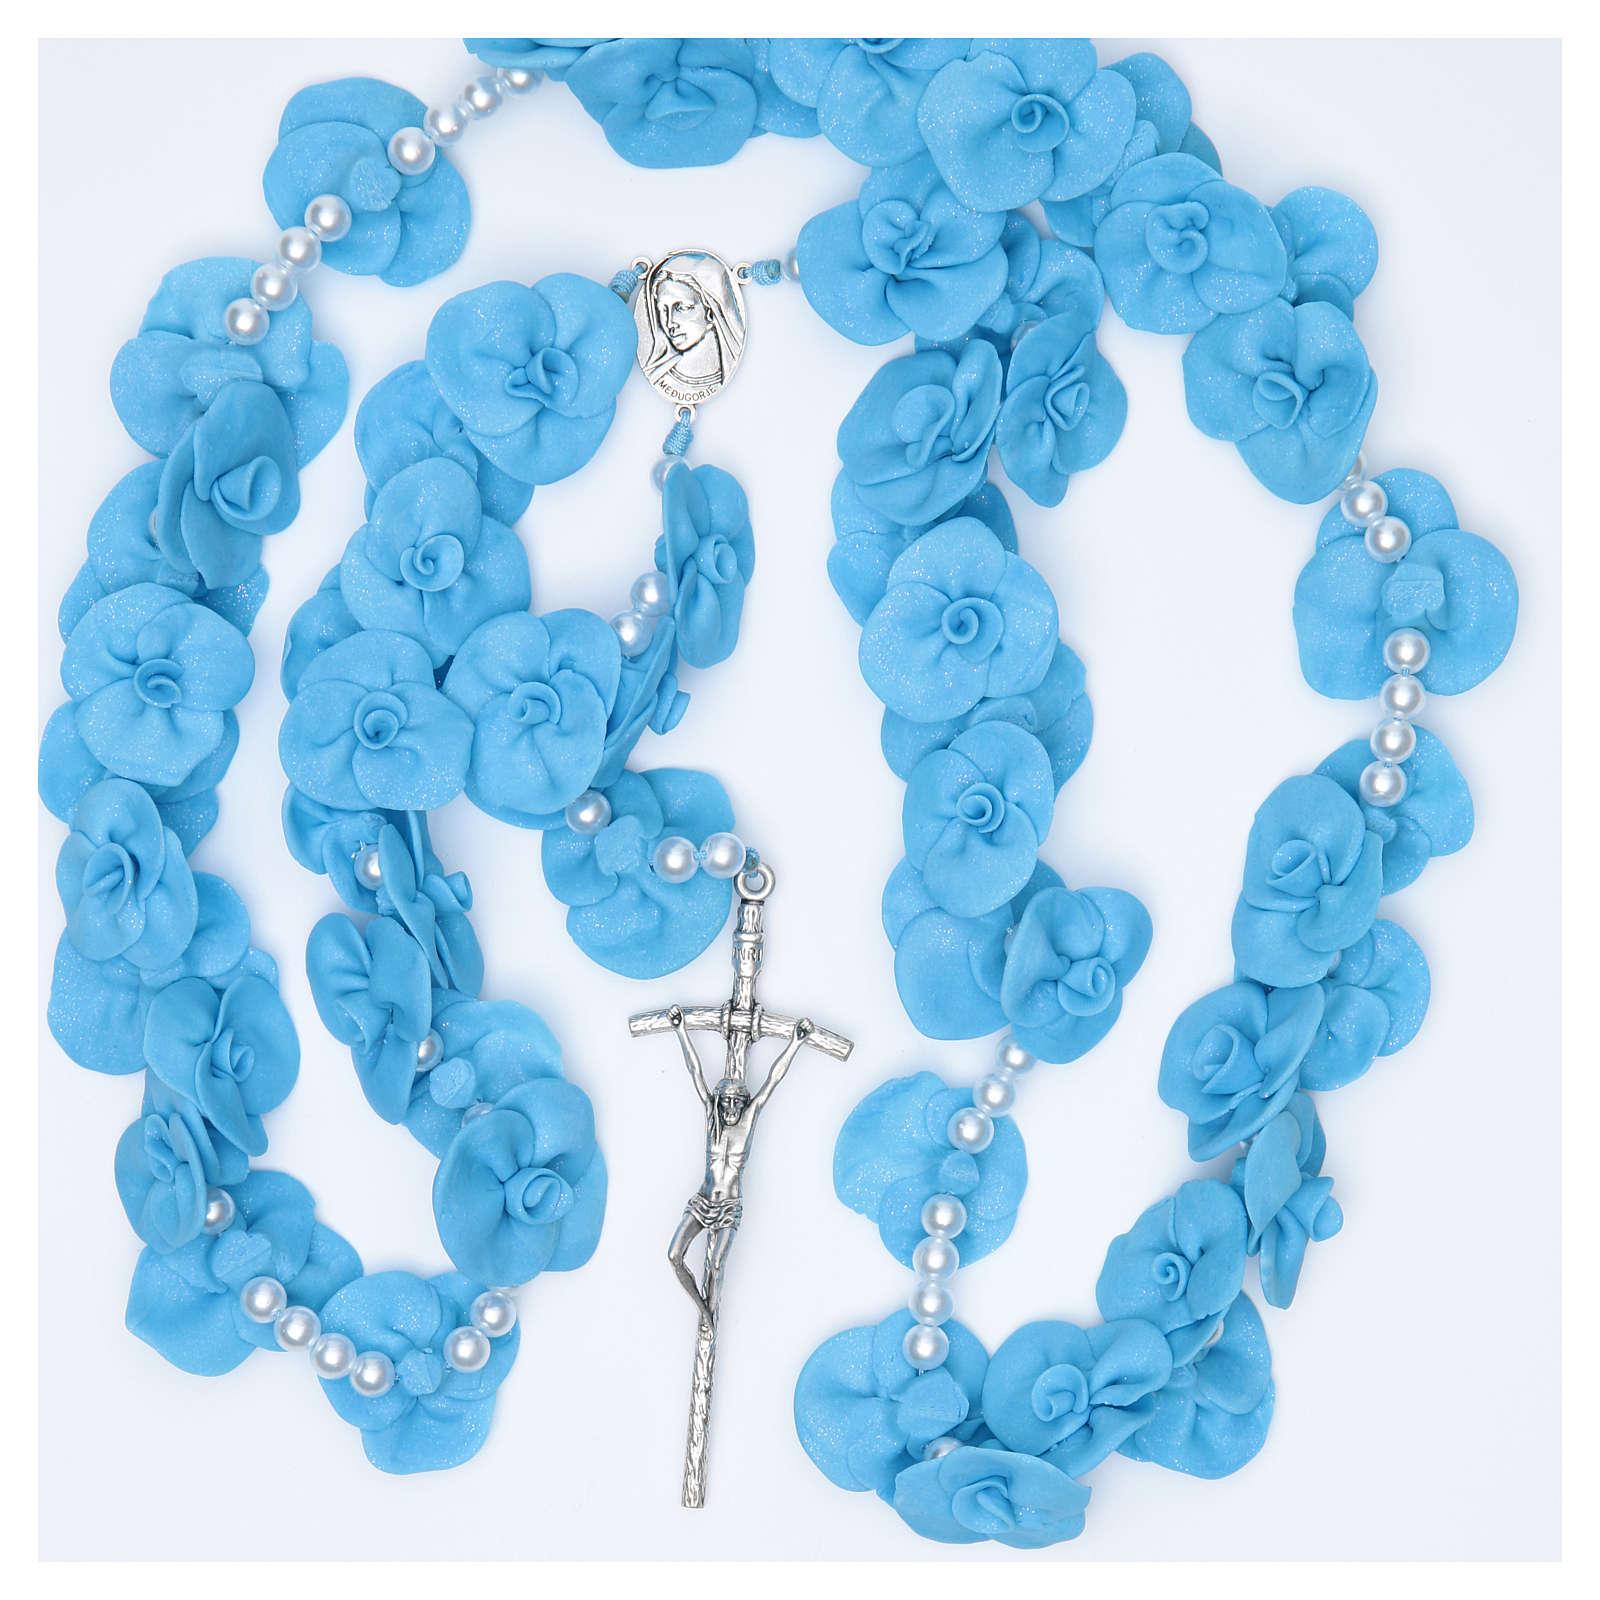 Headboard Medjugorje rosary with light blue roses 4